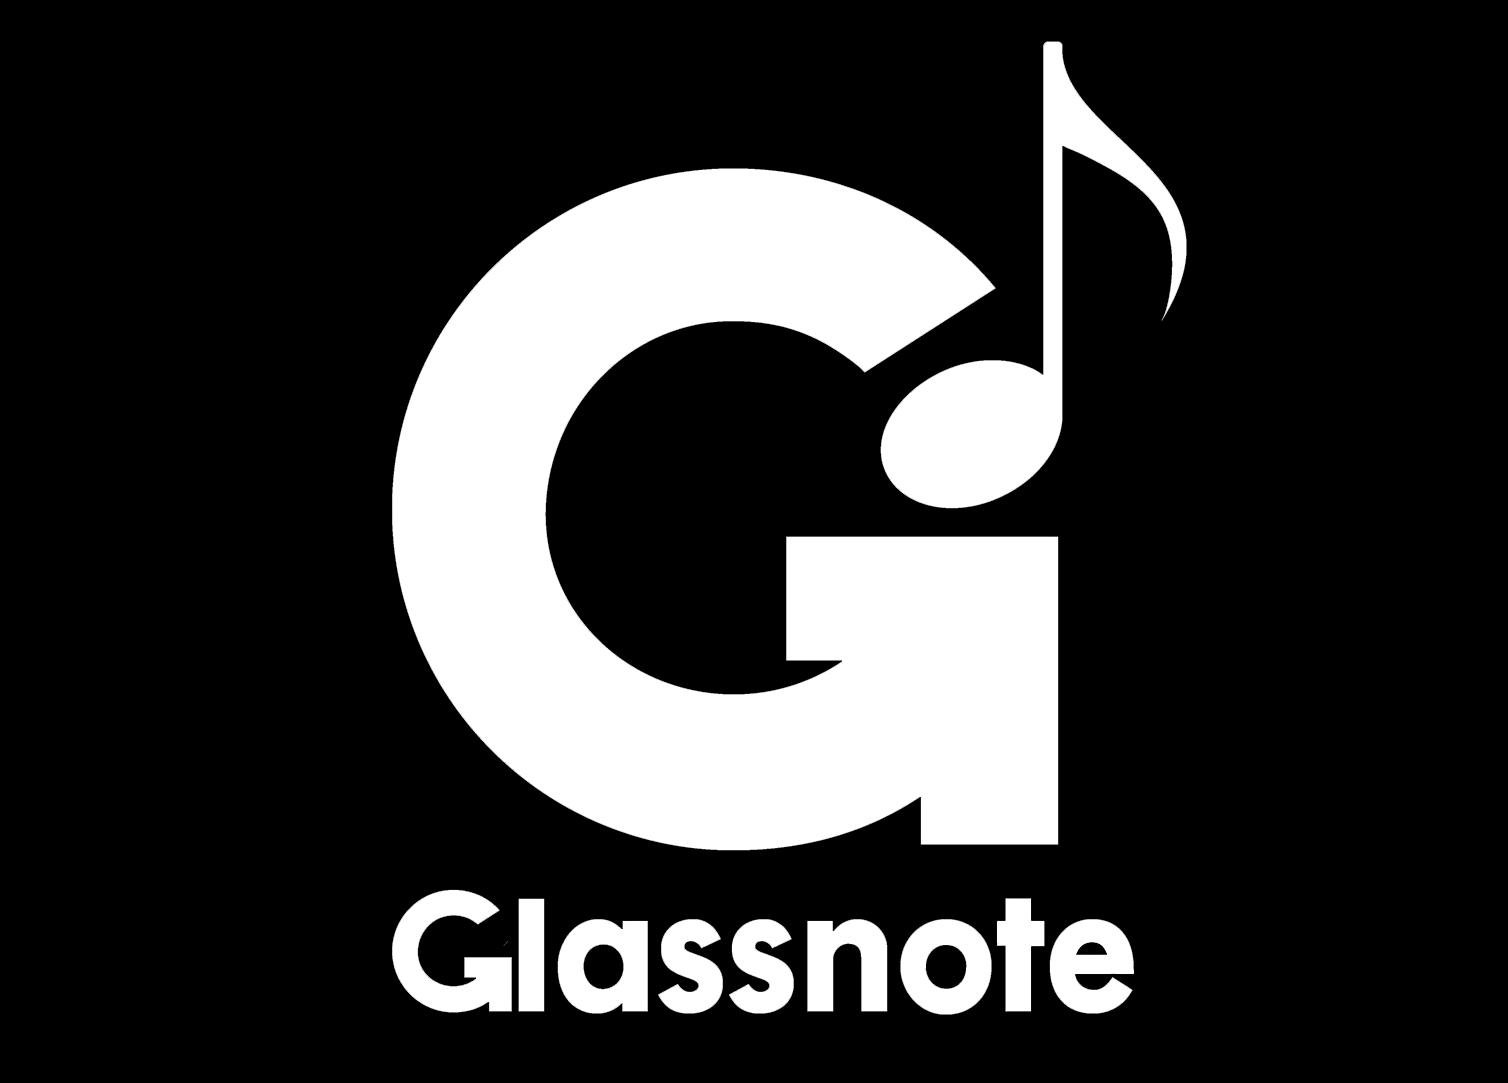 Glassnote_TheSyndicate_Marketing.jpg